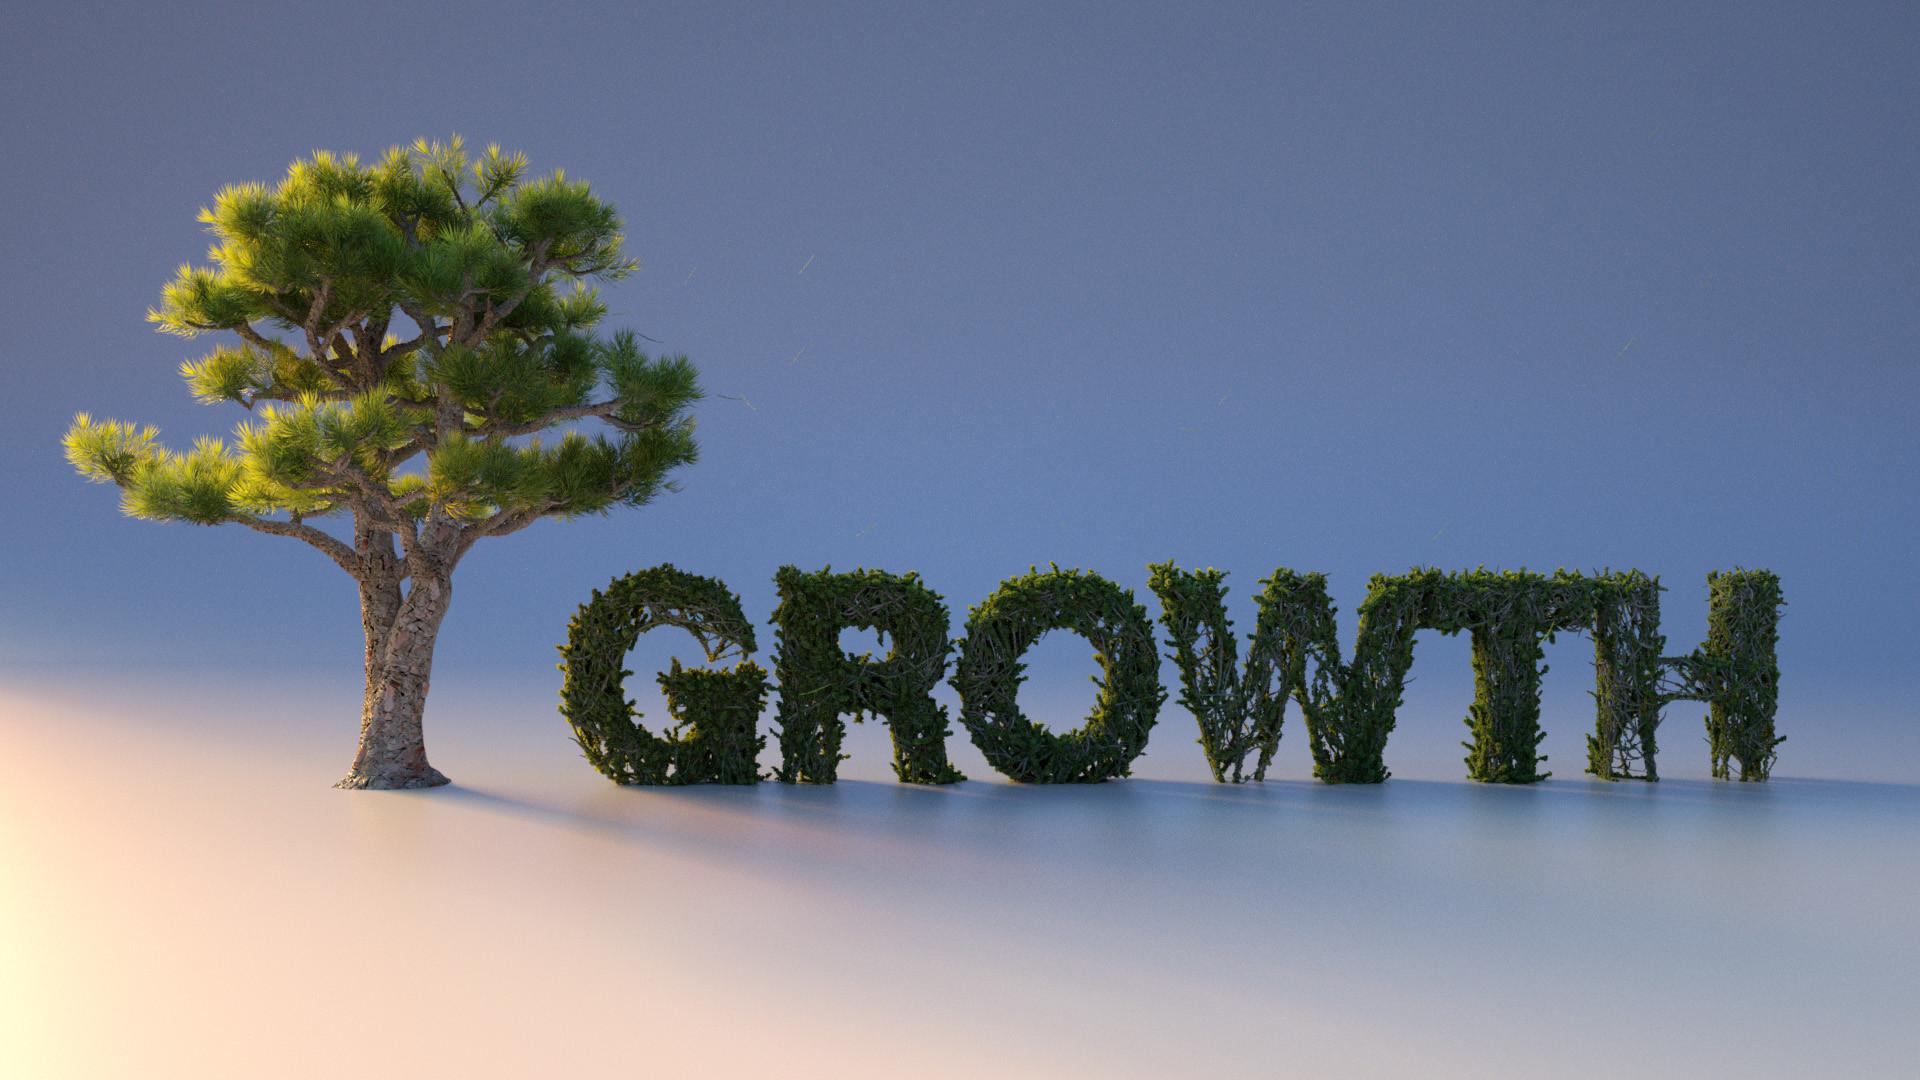 Coen brasser scene01 growth closeup02 0 00 09 22